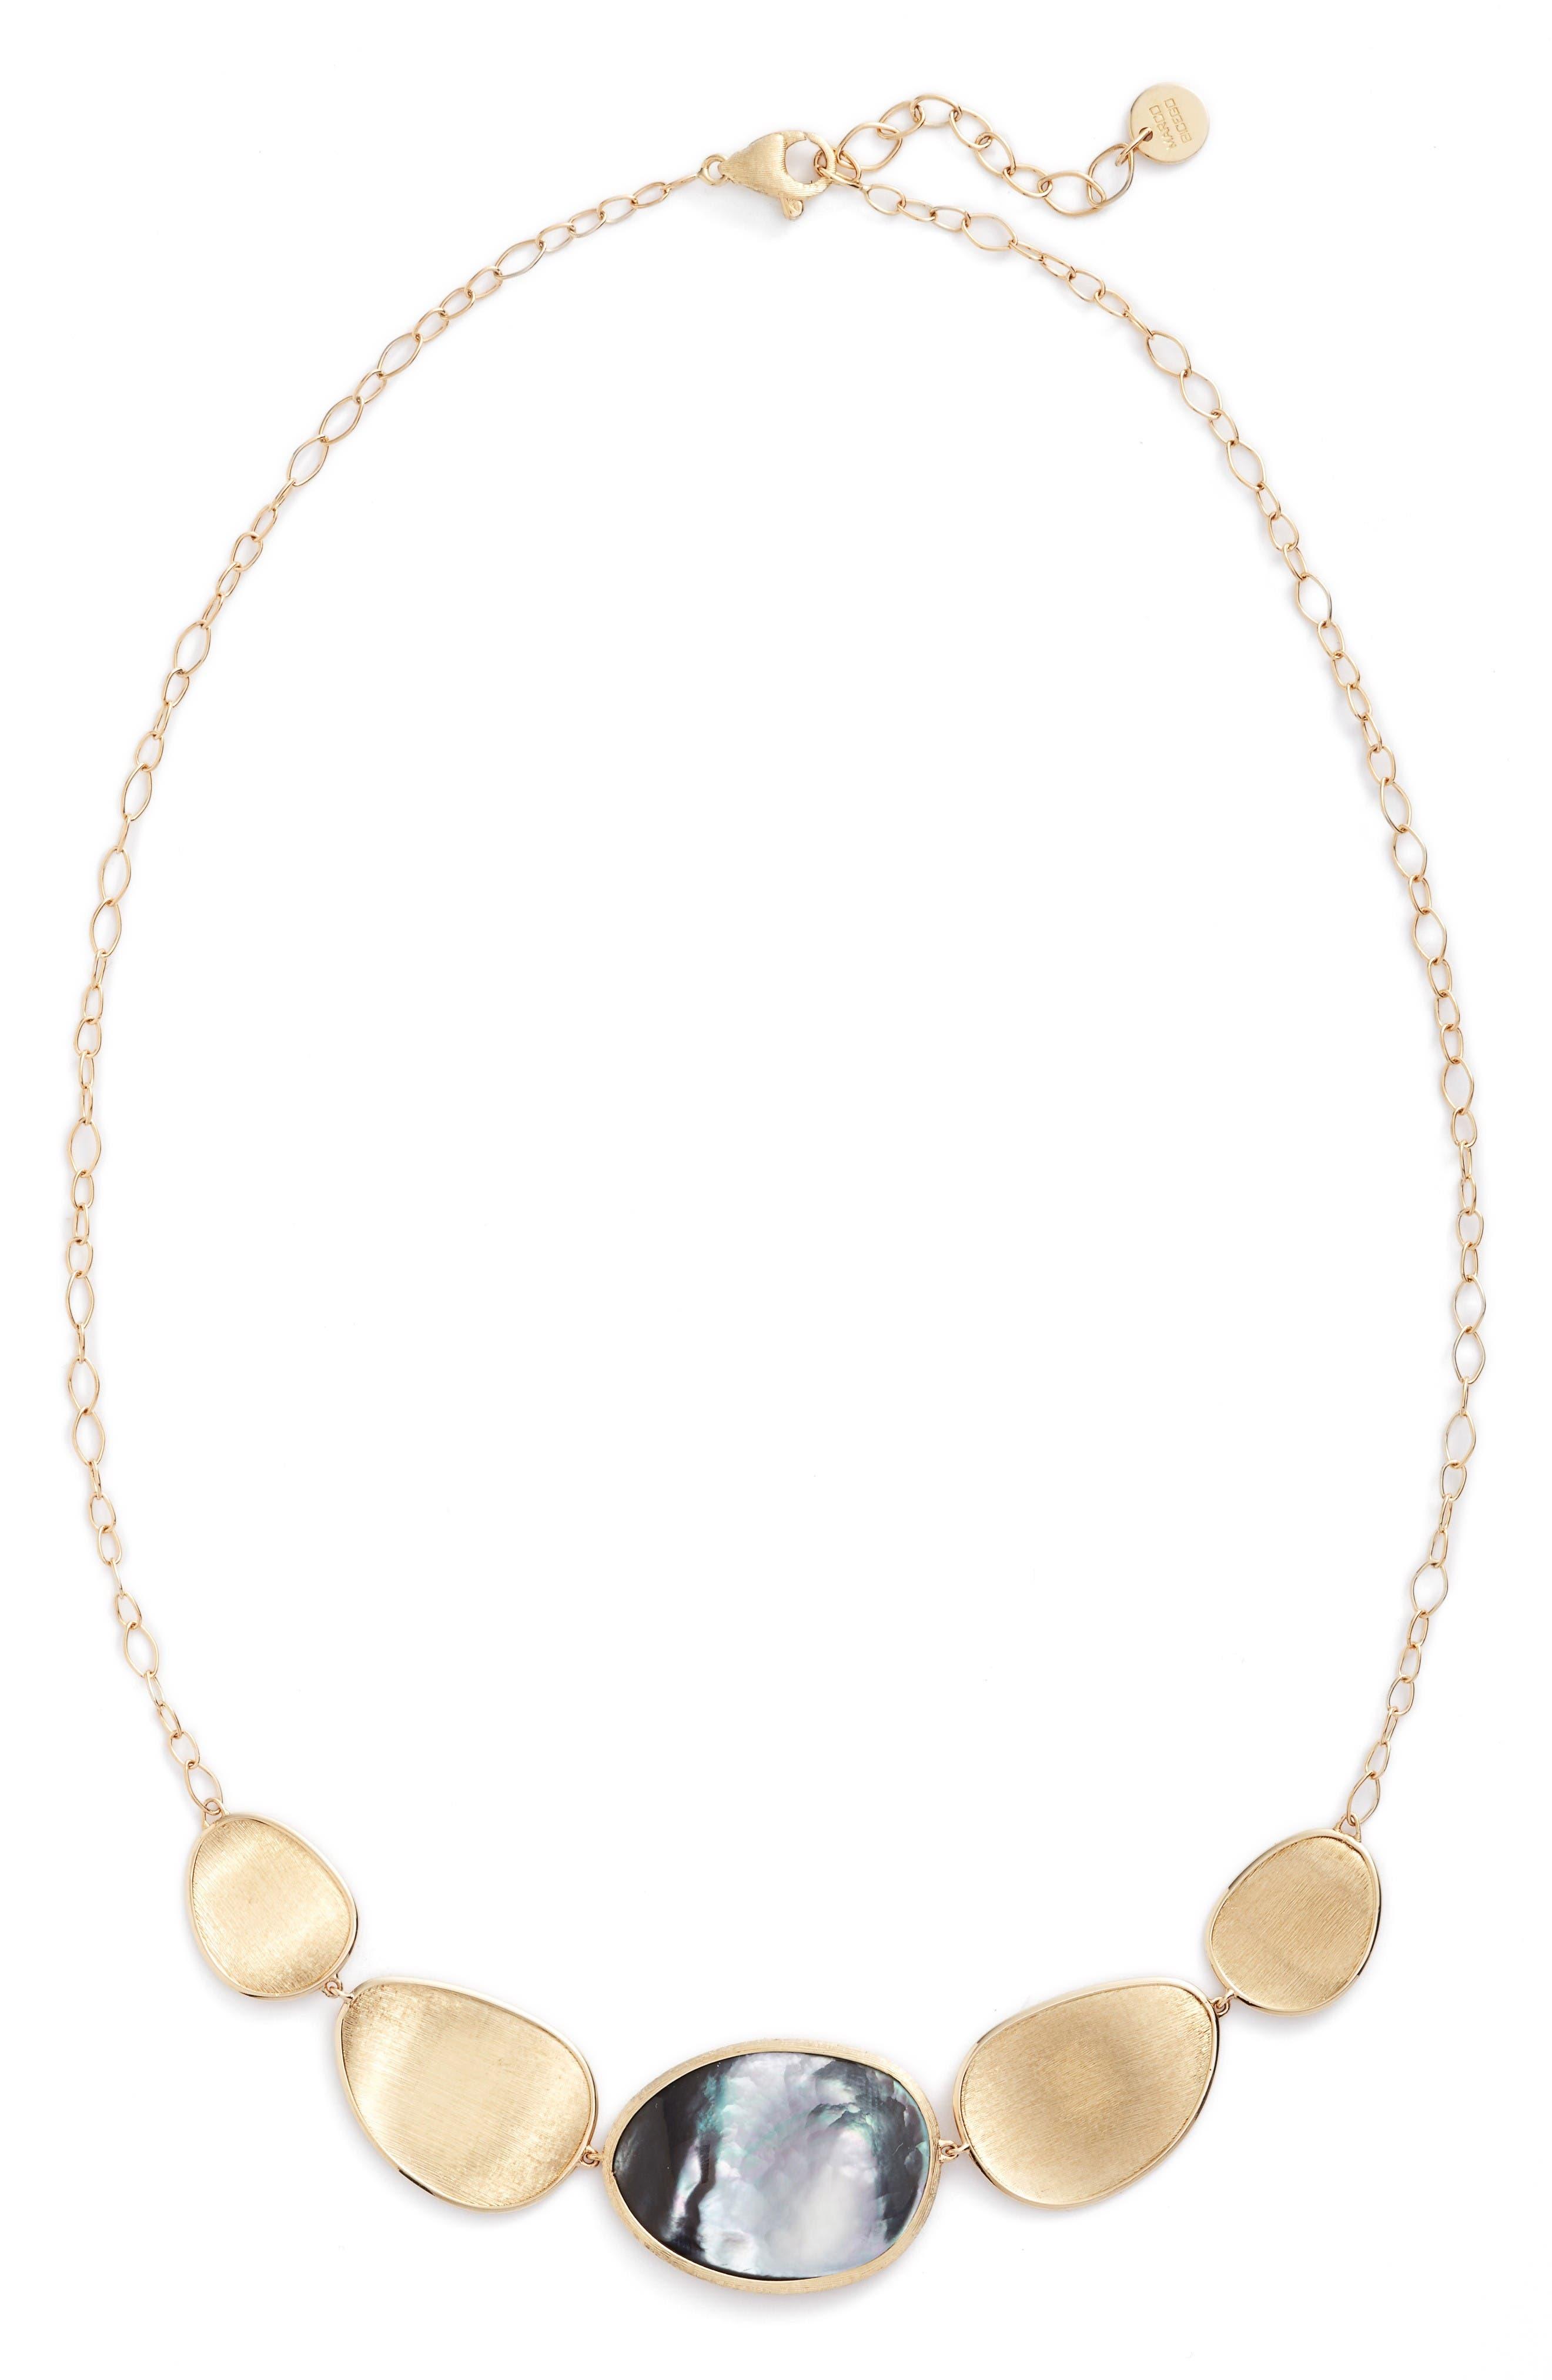 Main Image - Marco Bicego Lunaria Collar Necklace